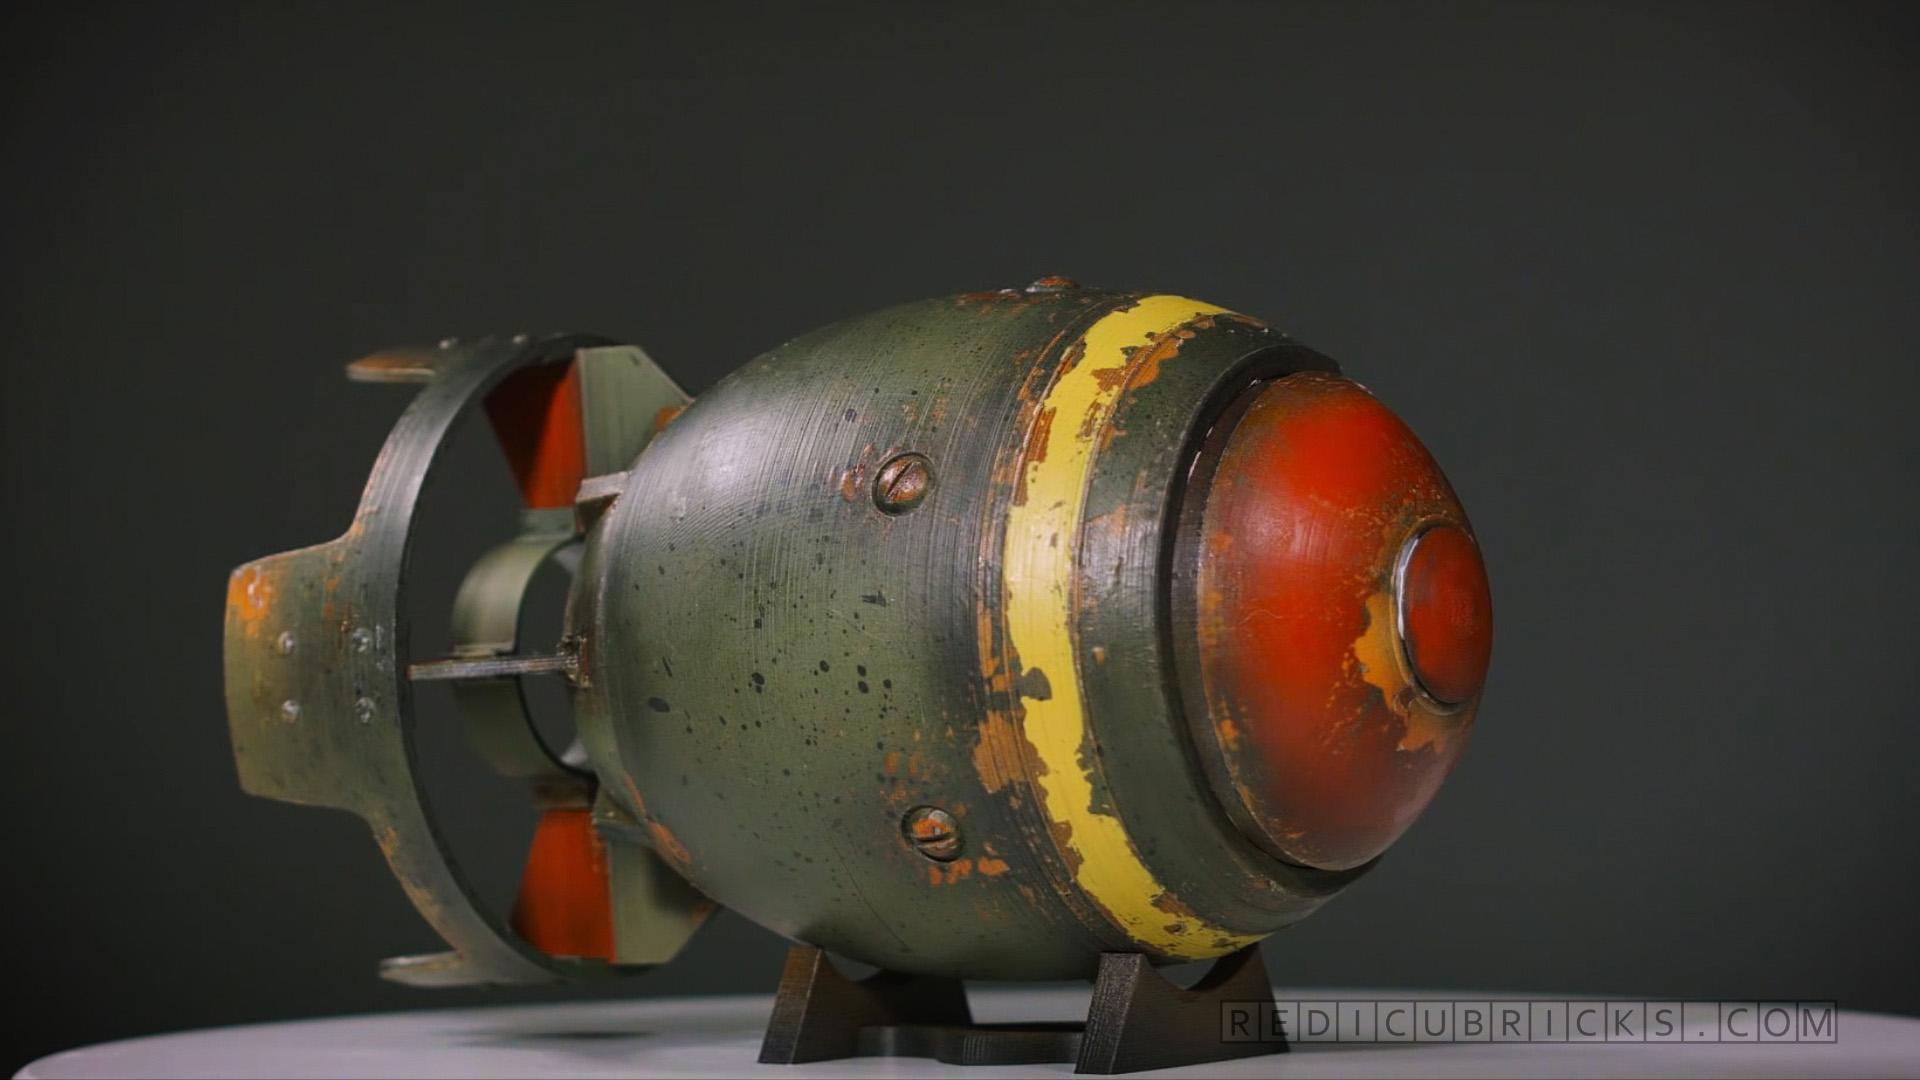 006 3D Printed Fallout Mini-Nuke Prop